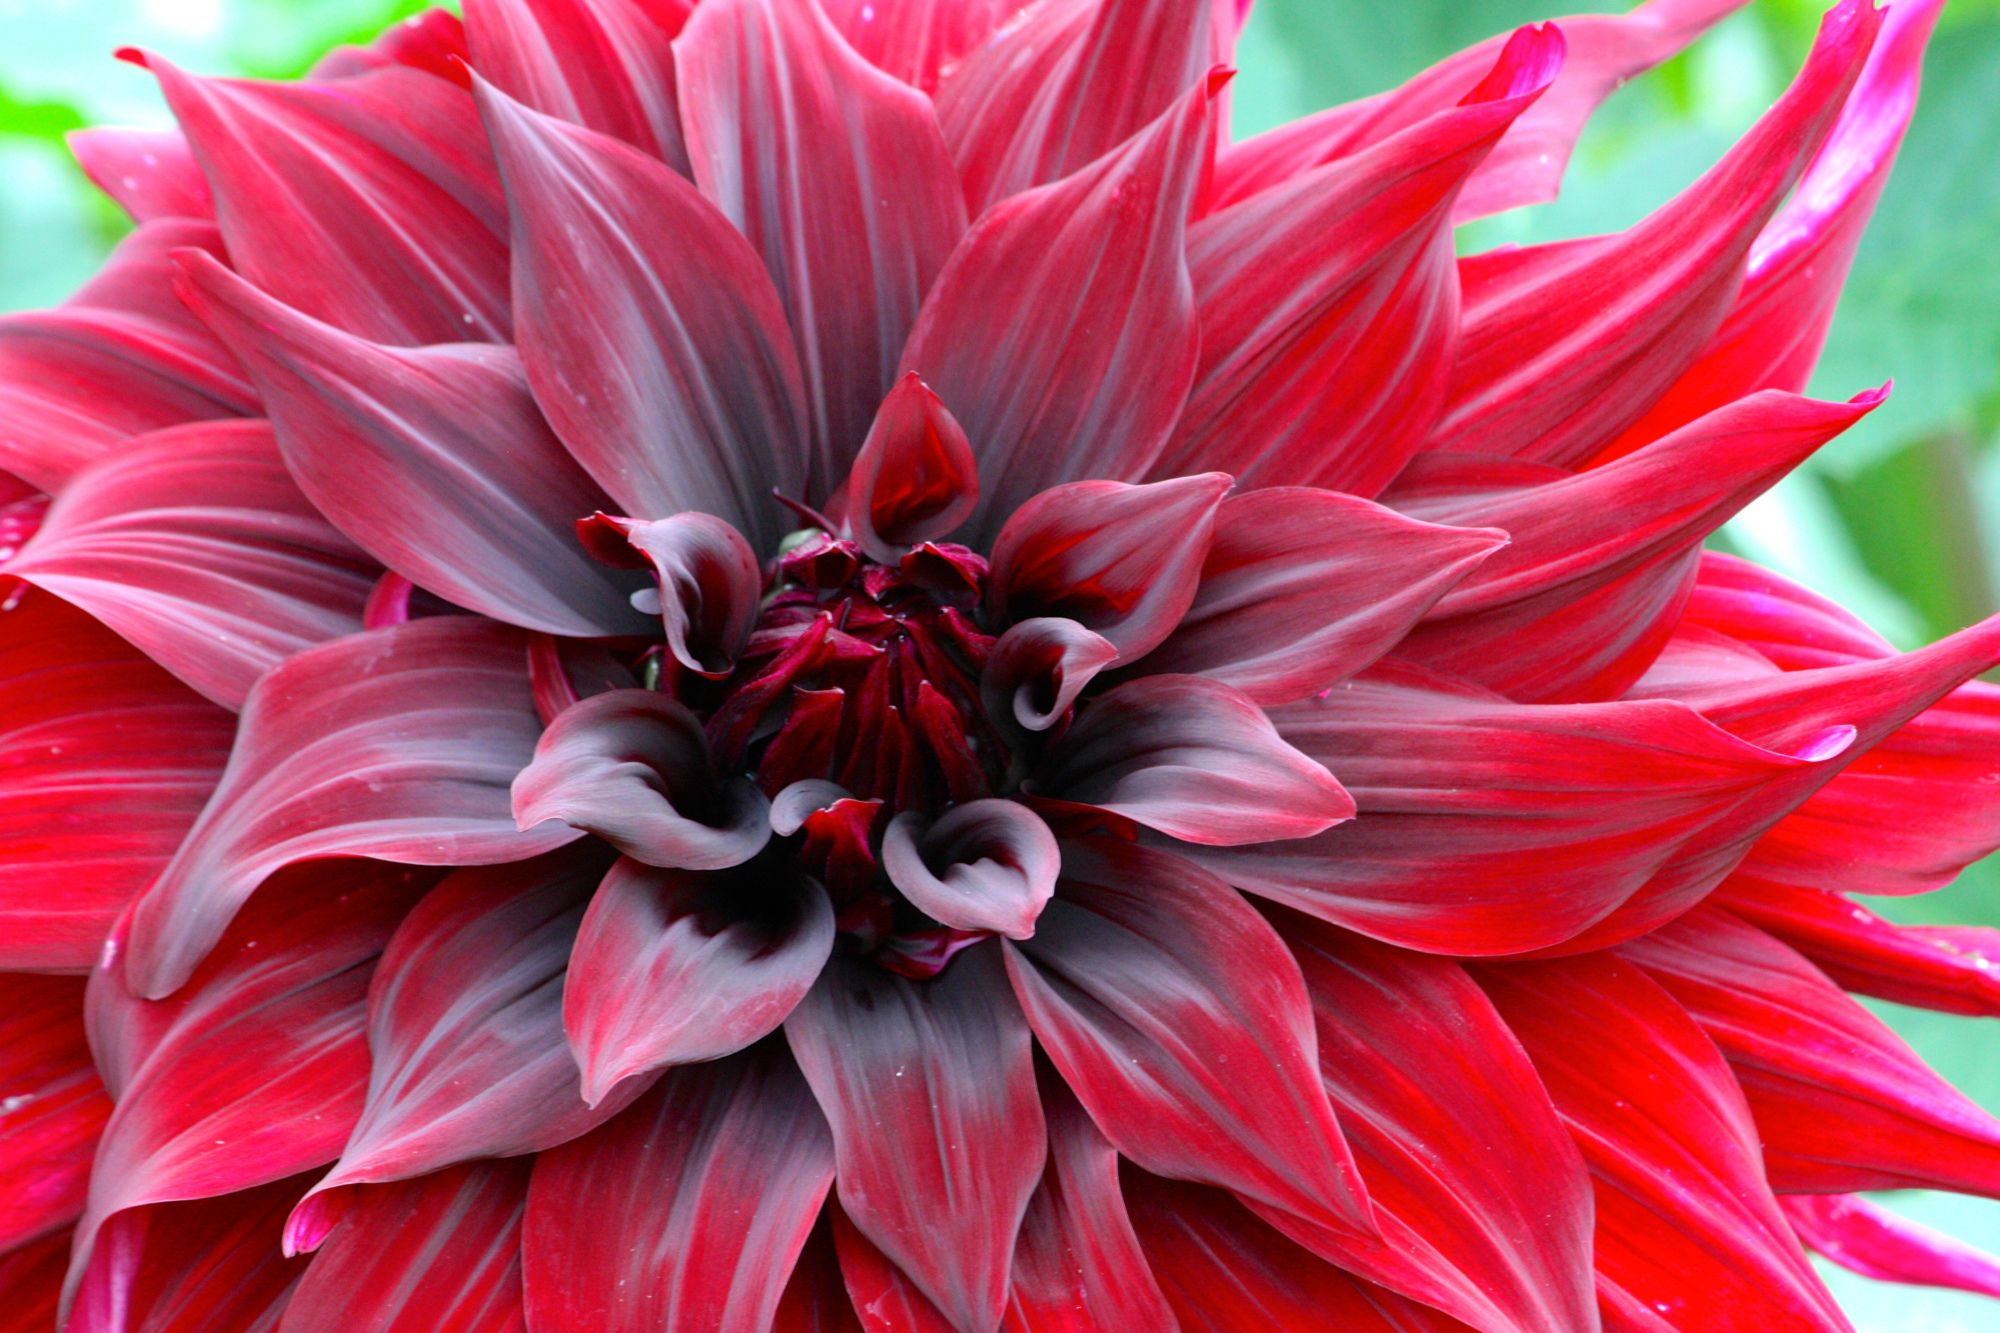 The dark, velvety blooms of Dahlia 'Black Monarch